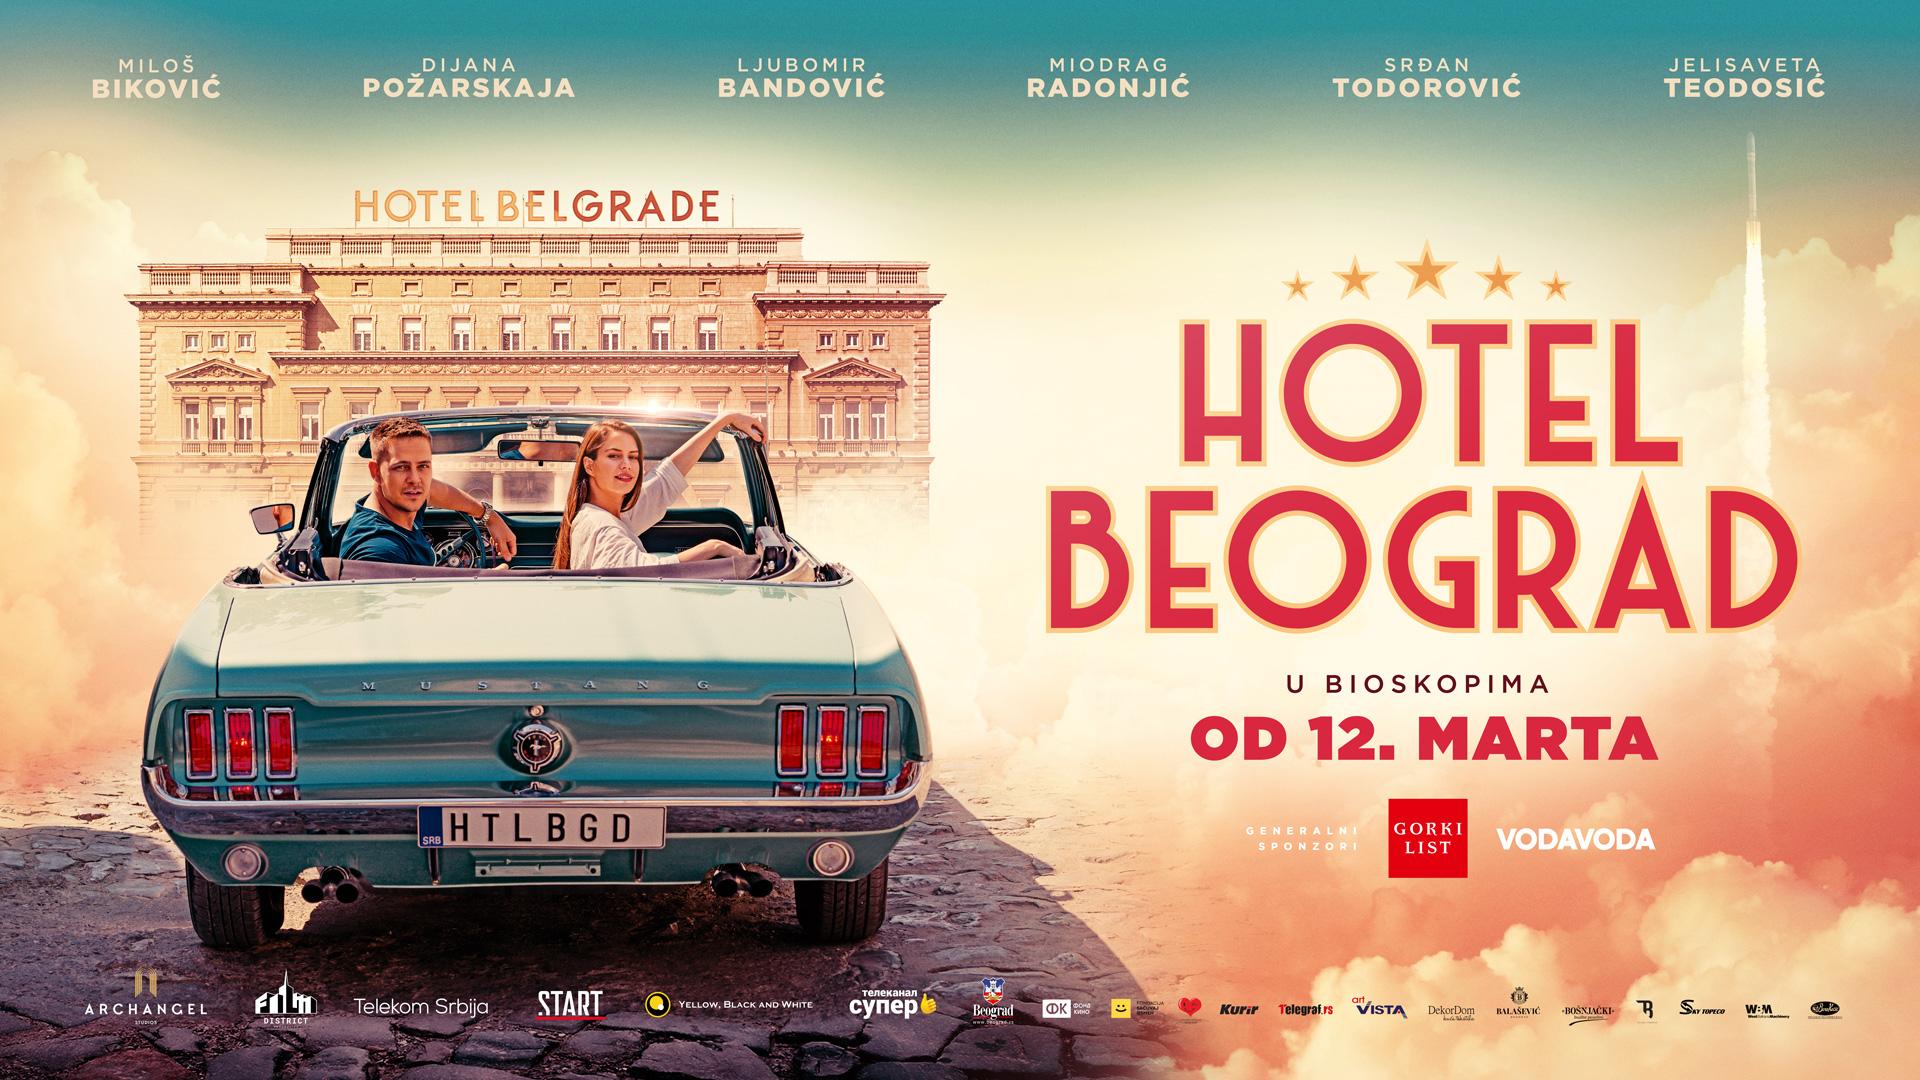 Hotel-Beograd-plakat-MUSTANG-horizontalni